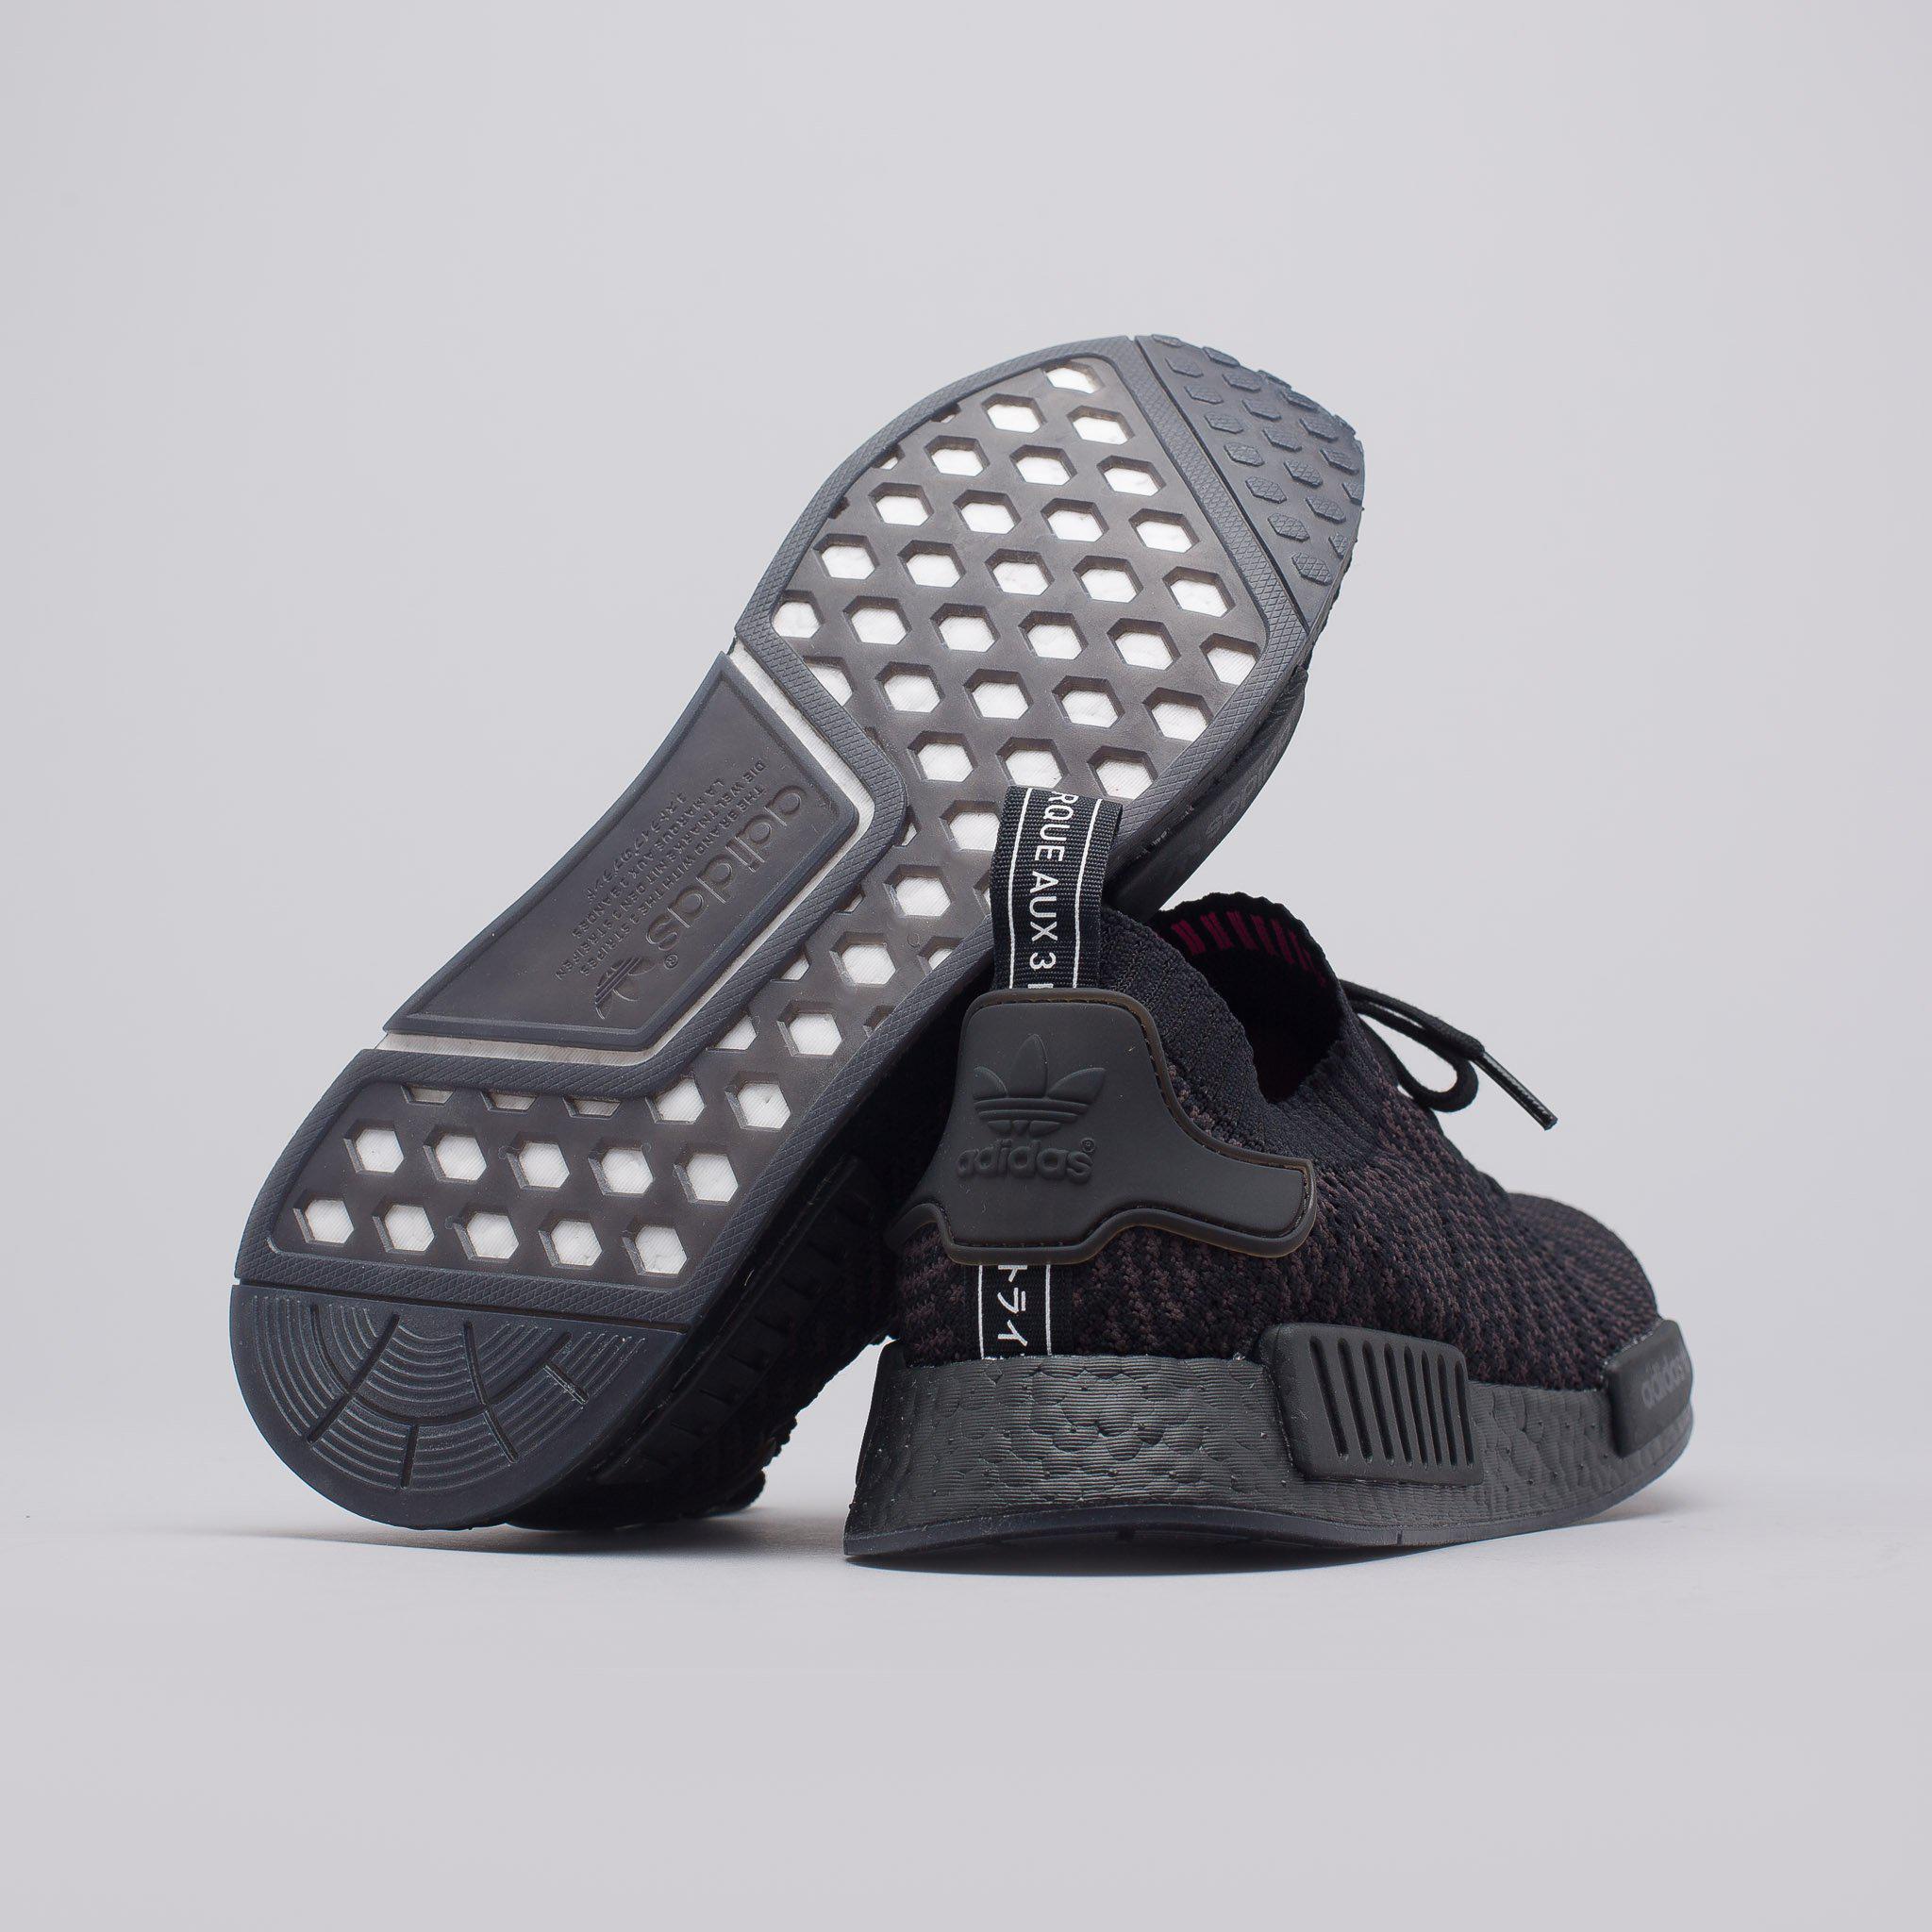 Minúsculo En la madrugada Ardiente  adidas Rubber Nmd R1 Stlt Primeknit In Triple Black for Men - Lyst